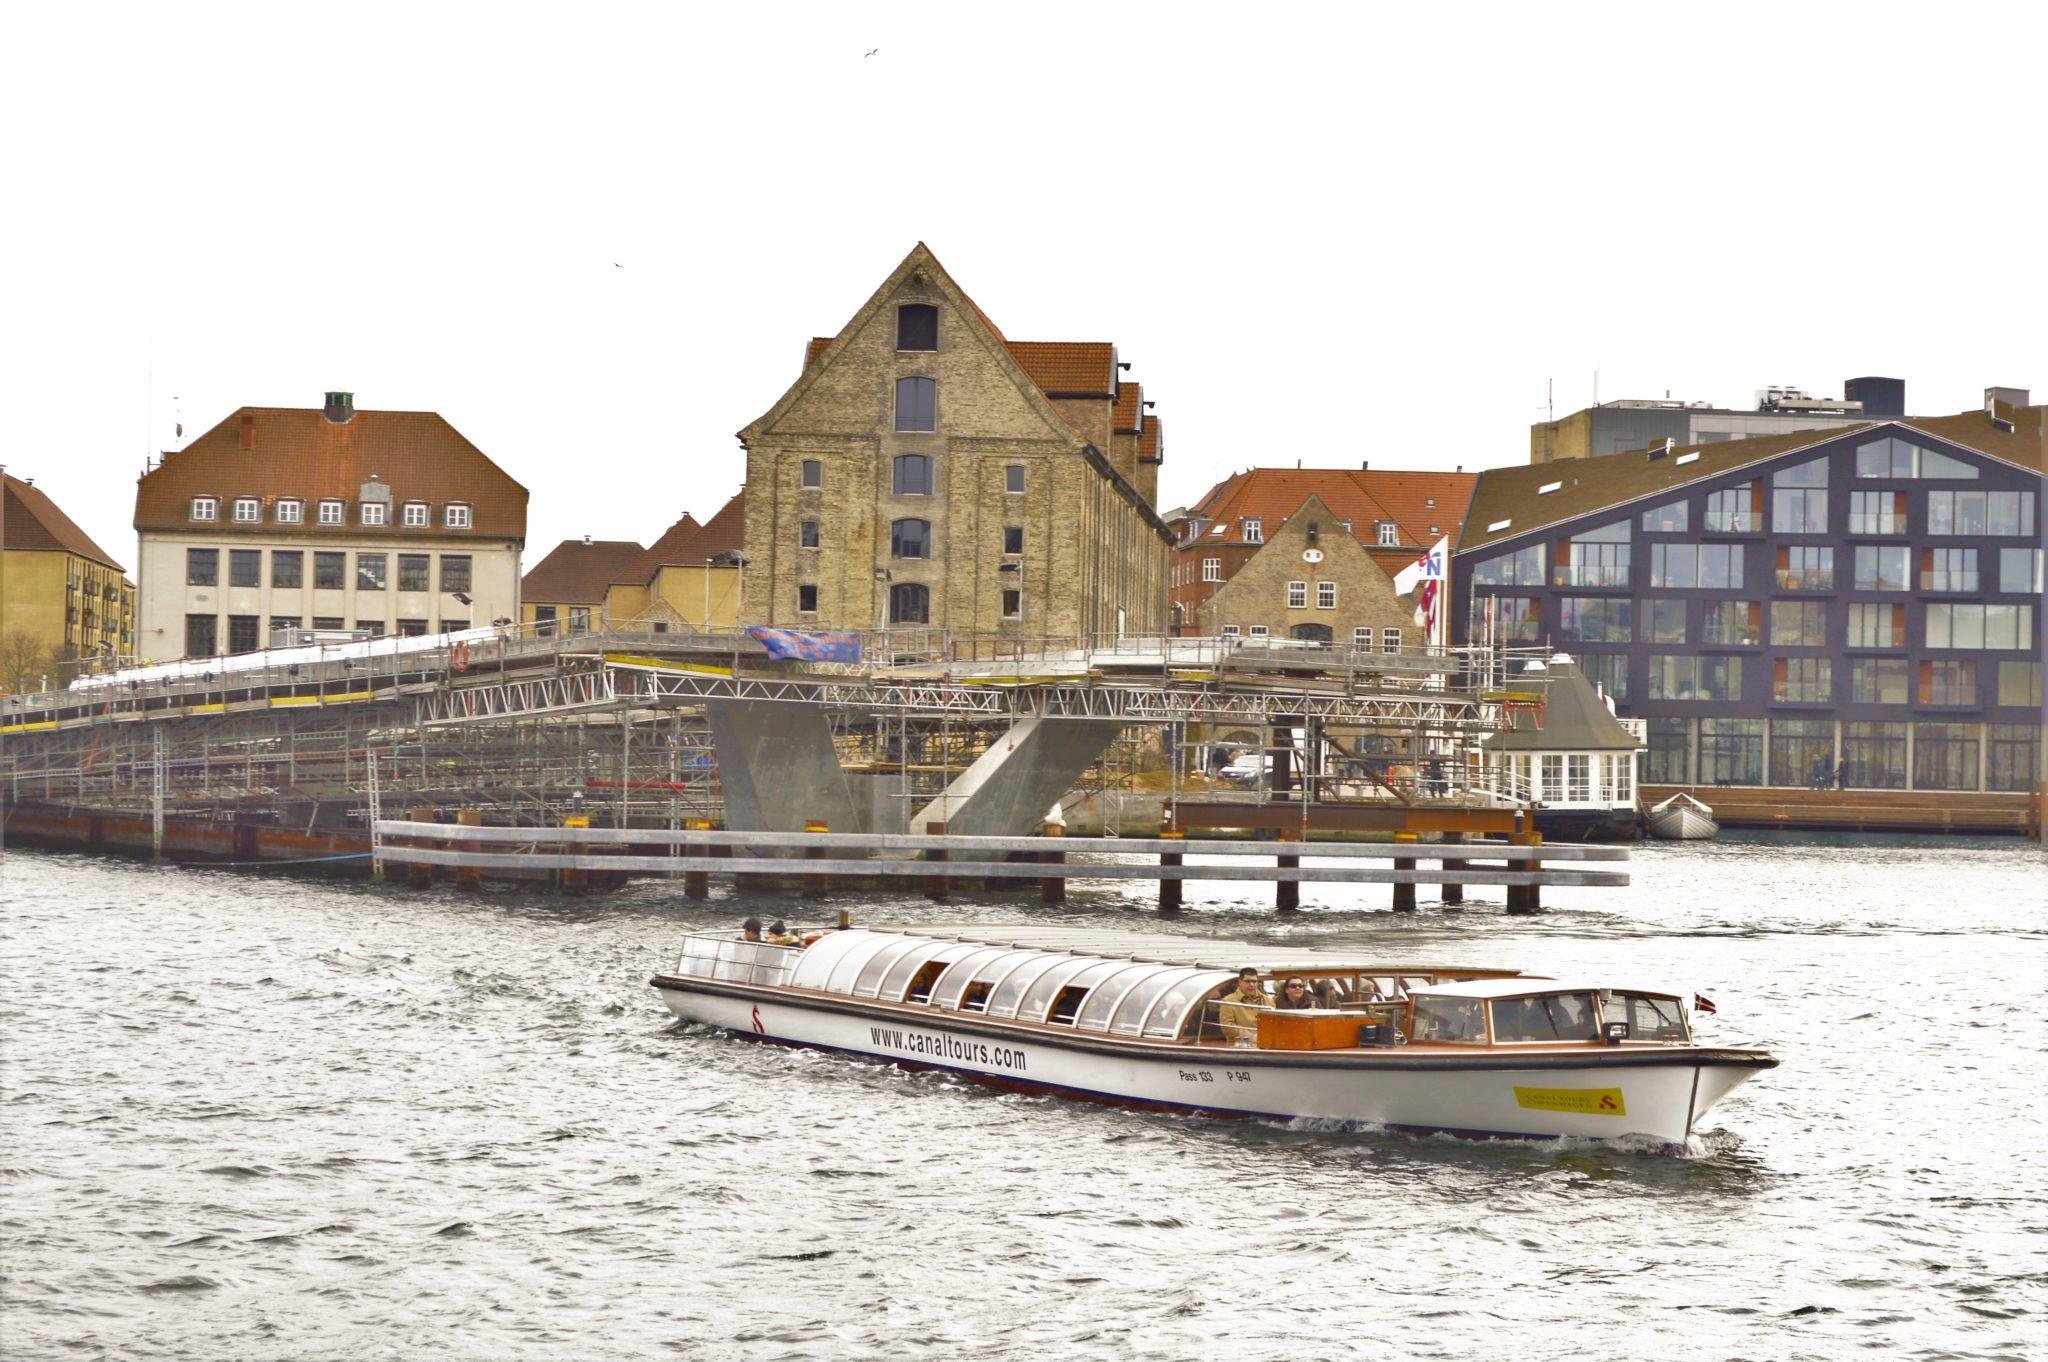 Boat trip, Copenhagen, Denmark